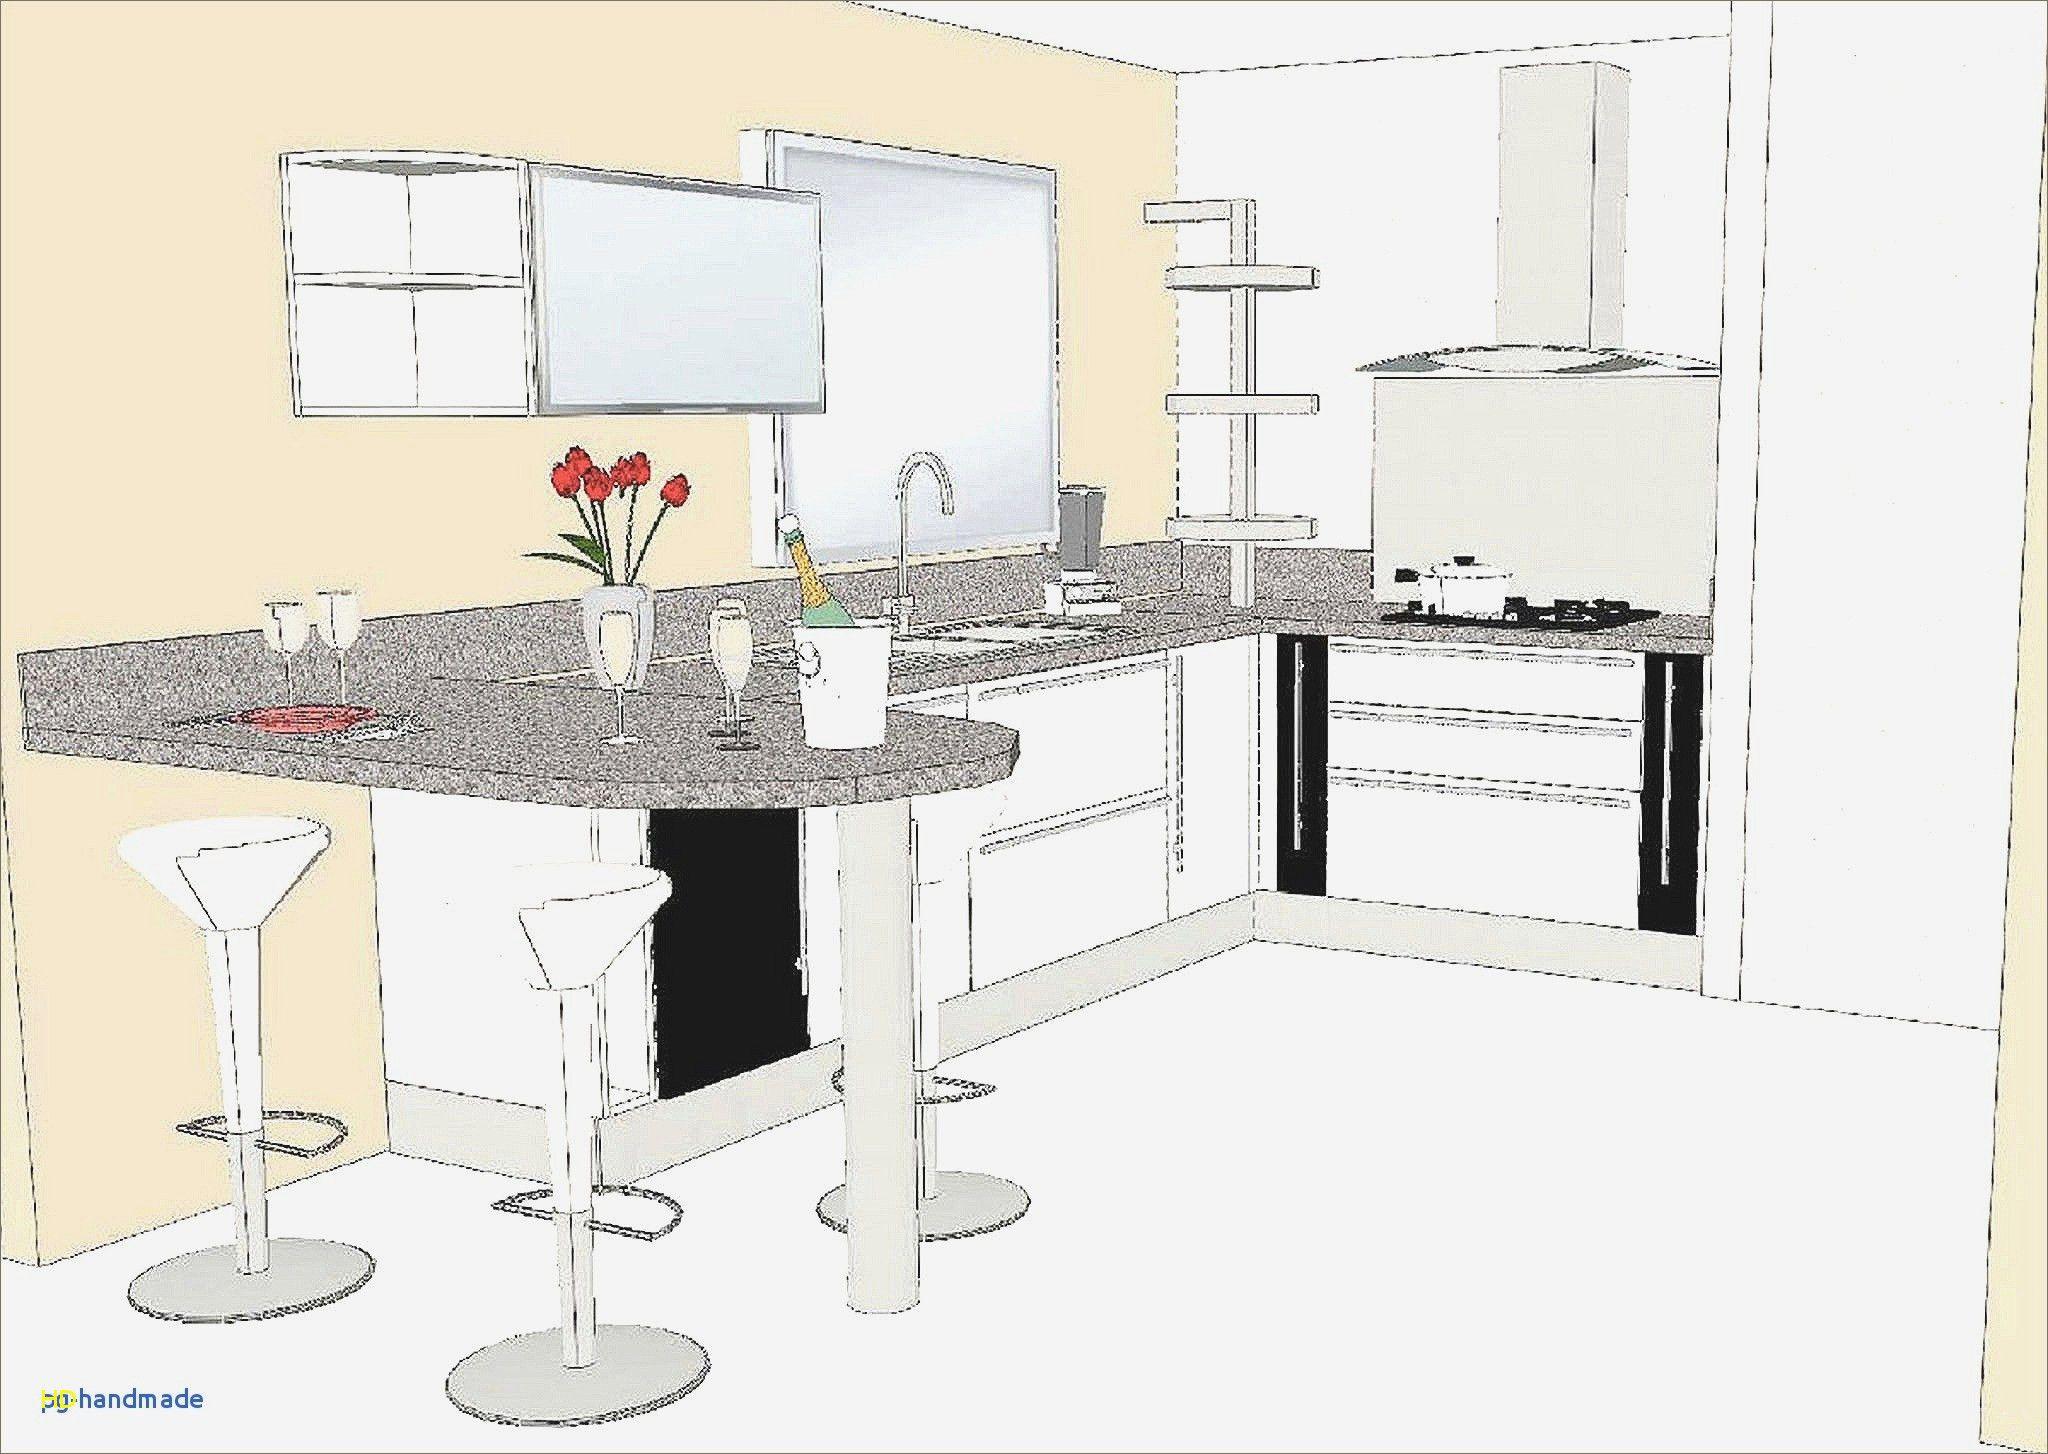 Fresh Logiciel Dessin Cuisine Gratuit Home Decor Design Furniture